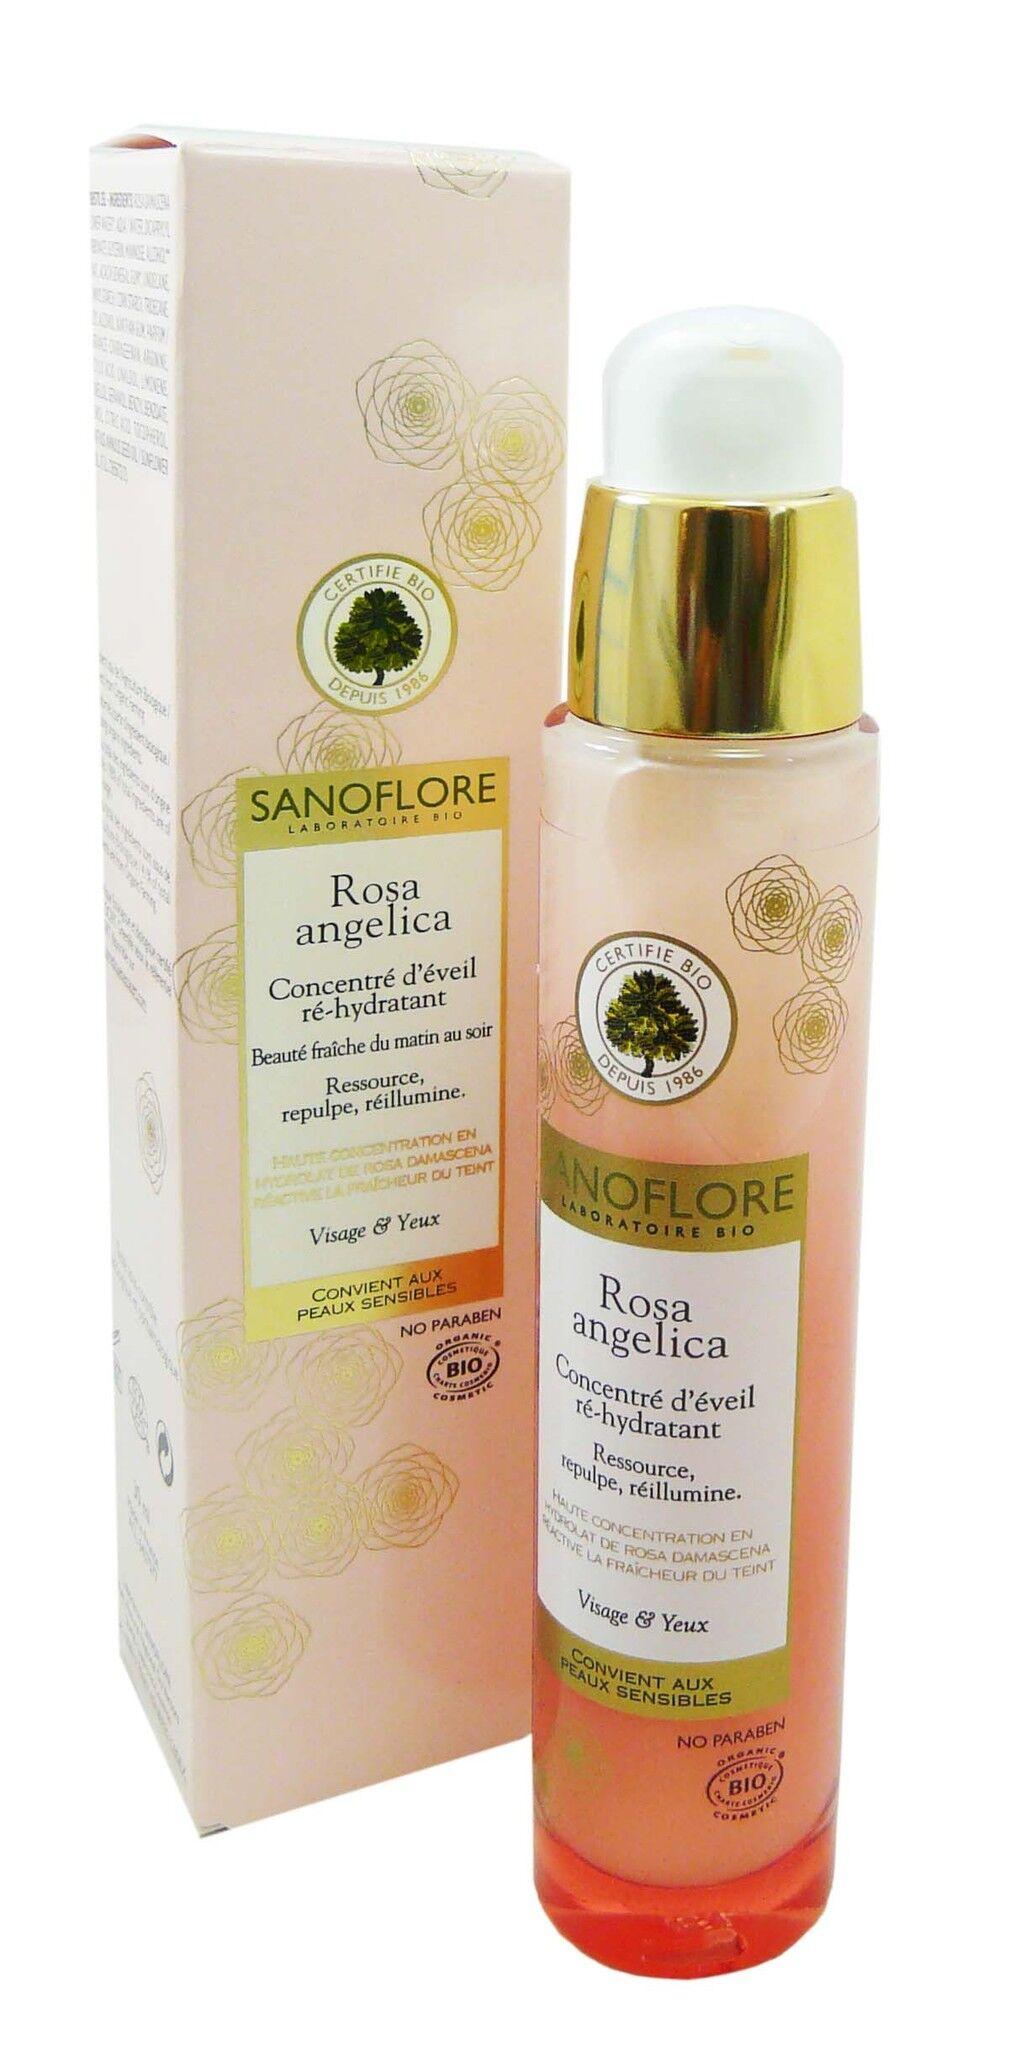 Sanoflore rosa angelica concentre d'eveil 30ml